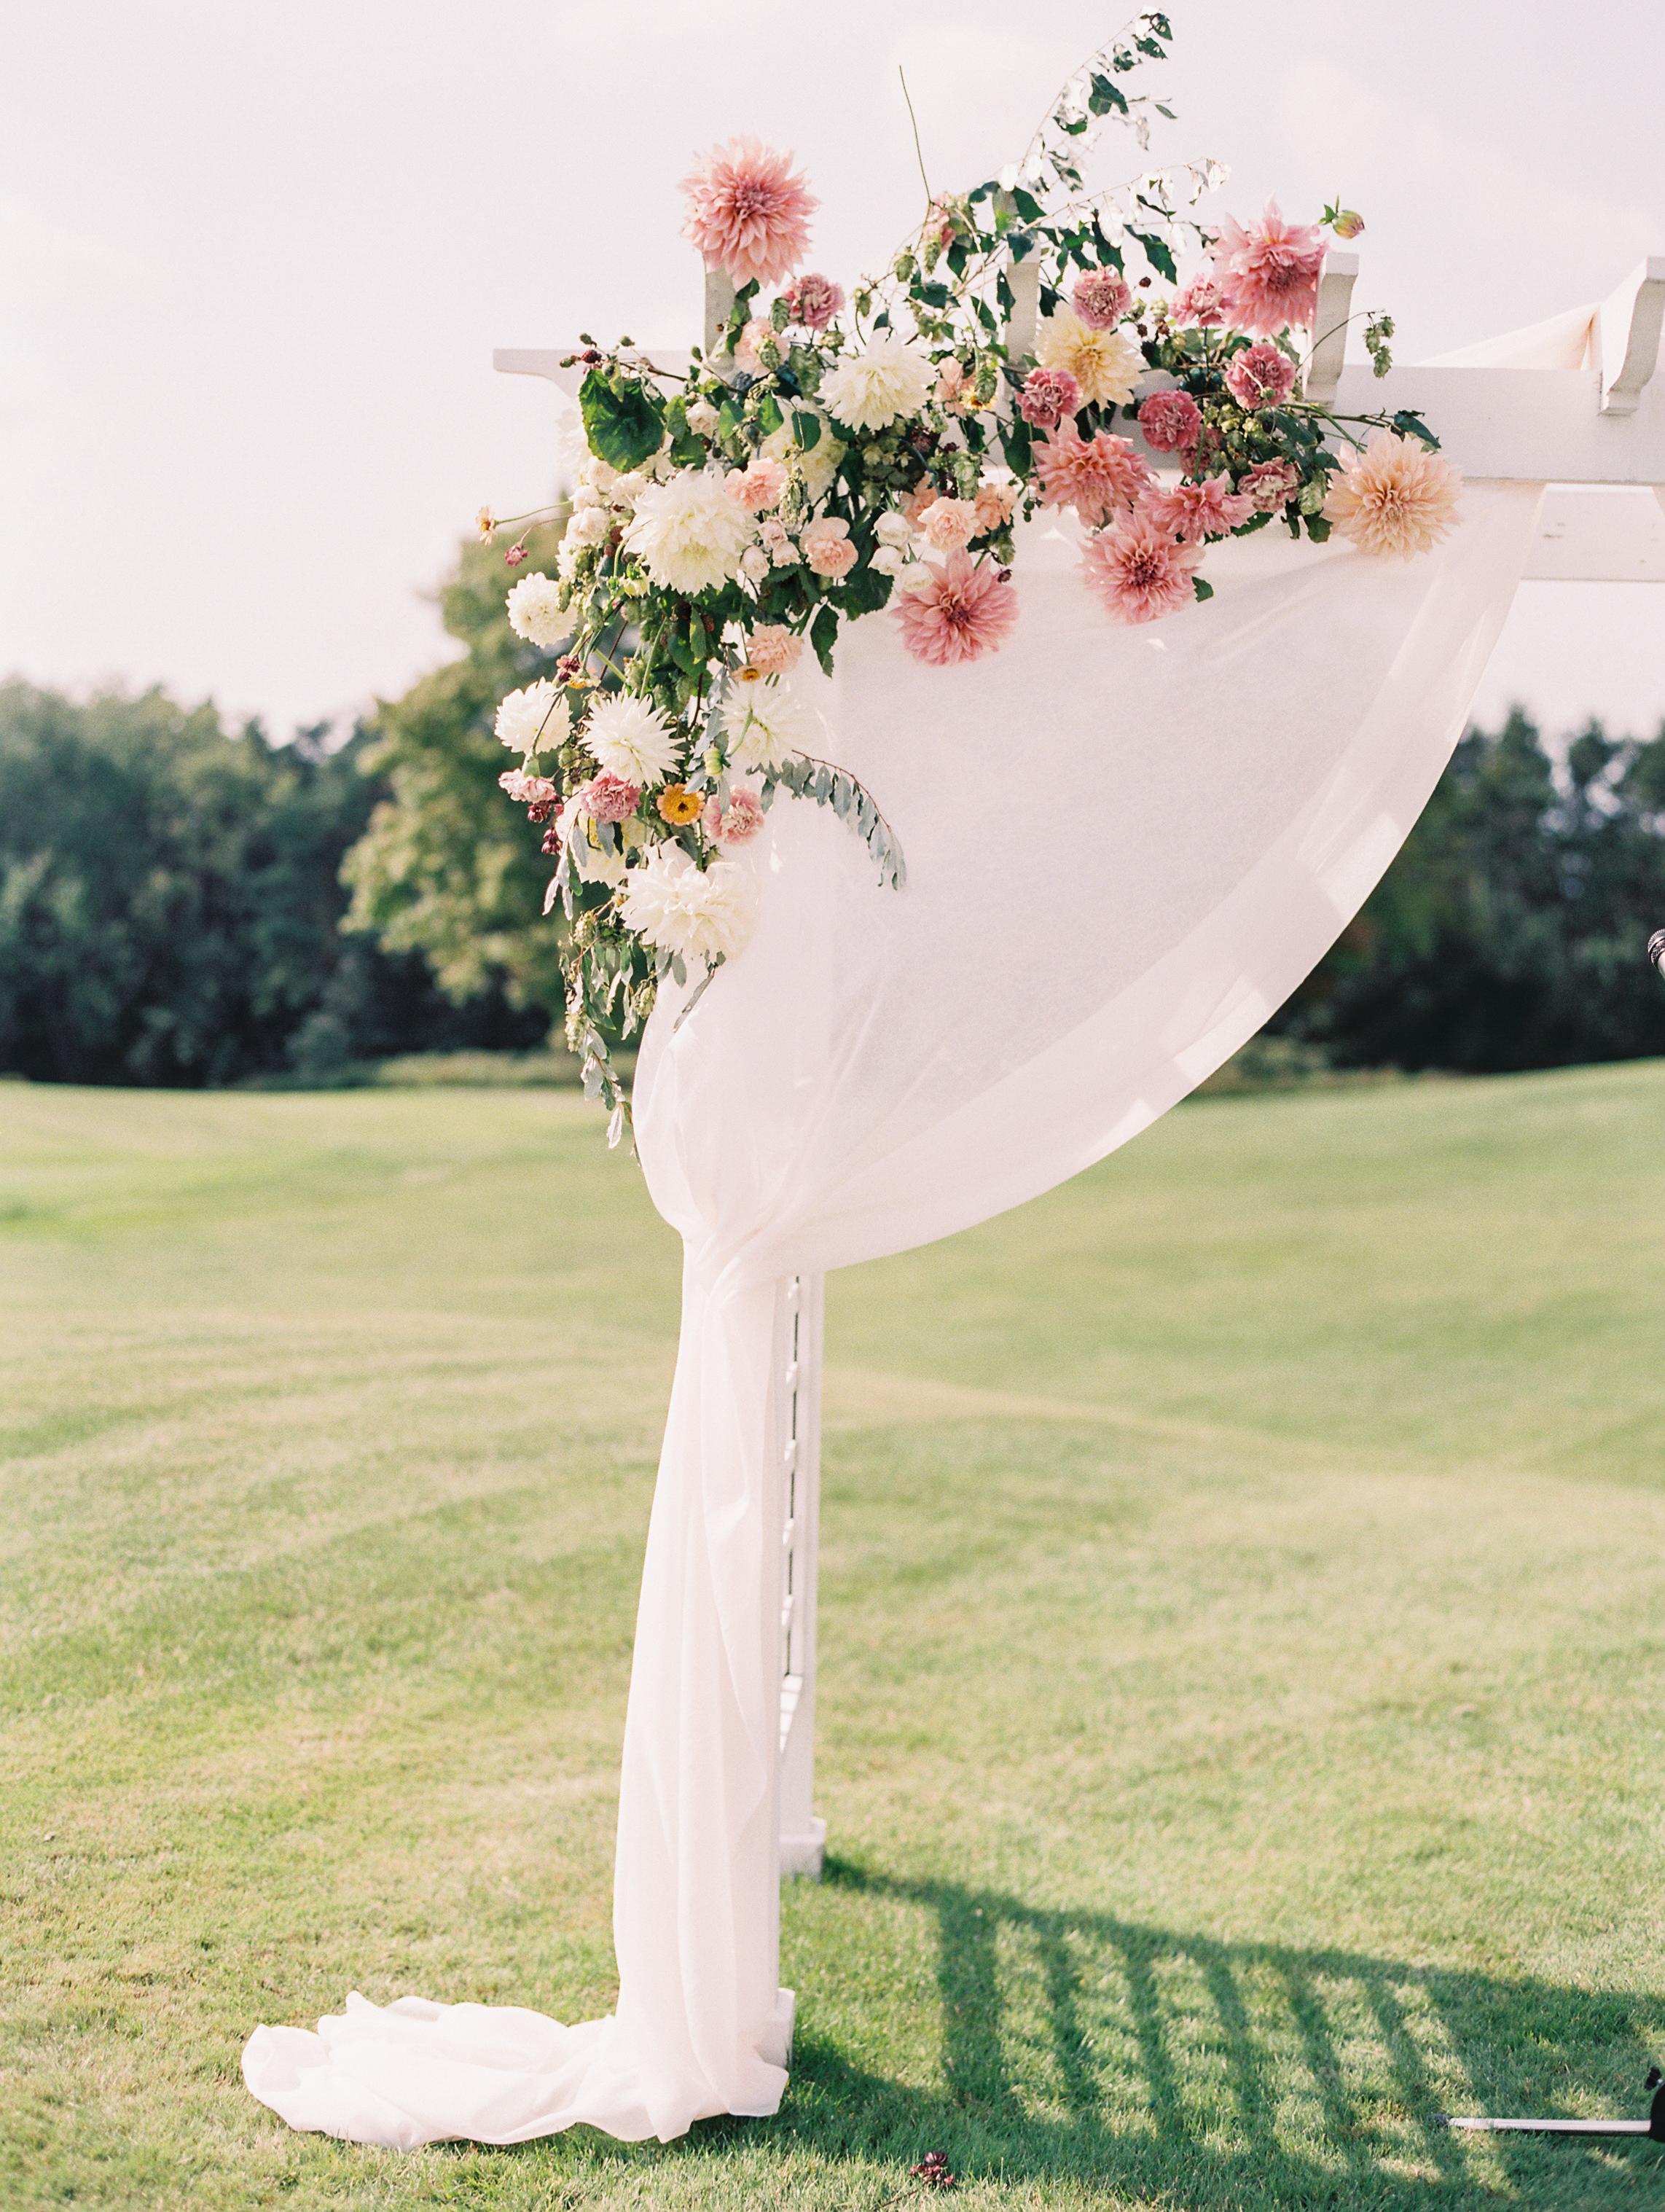 Zoller+Wedding+Ceremonyf-15.jpg